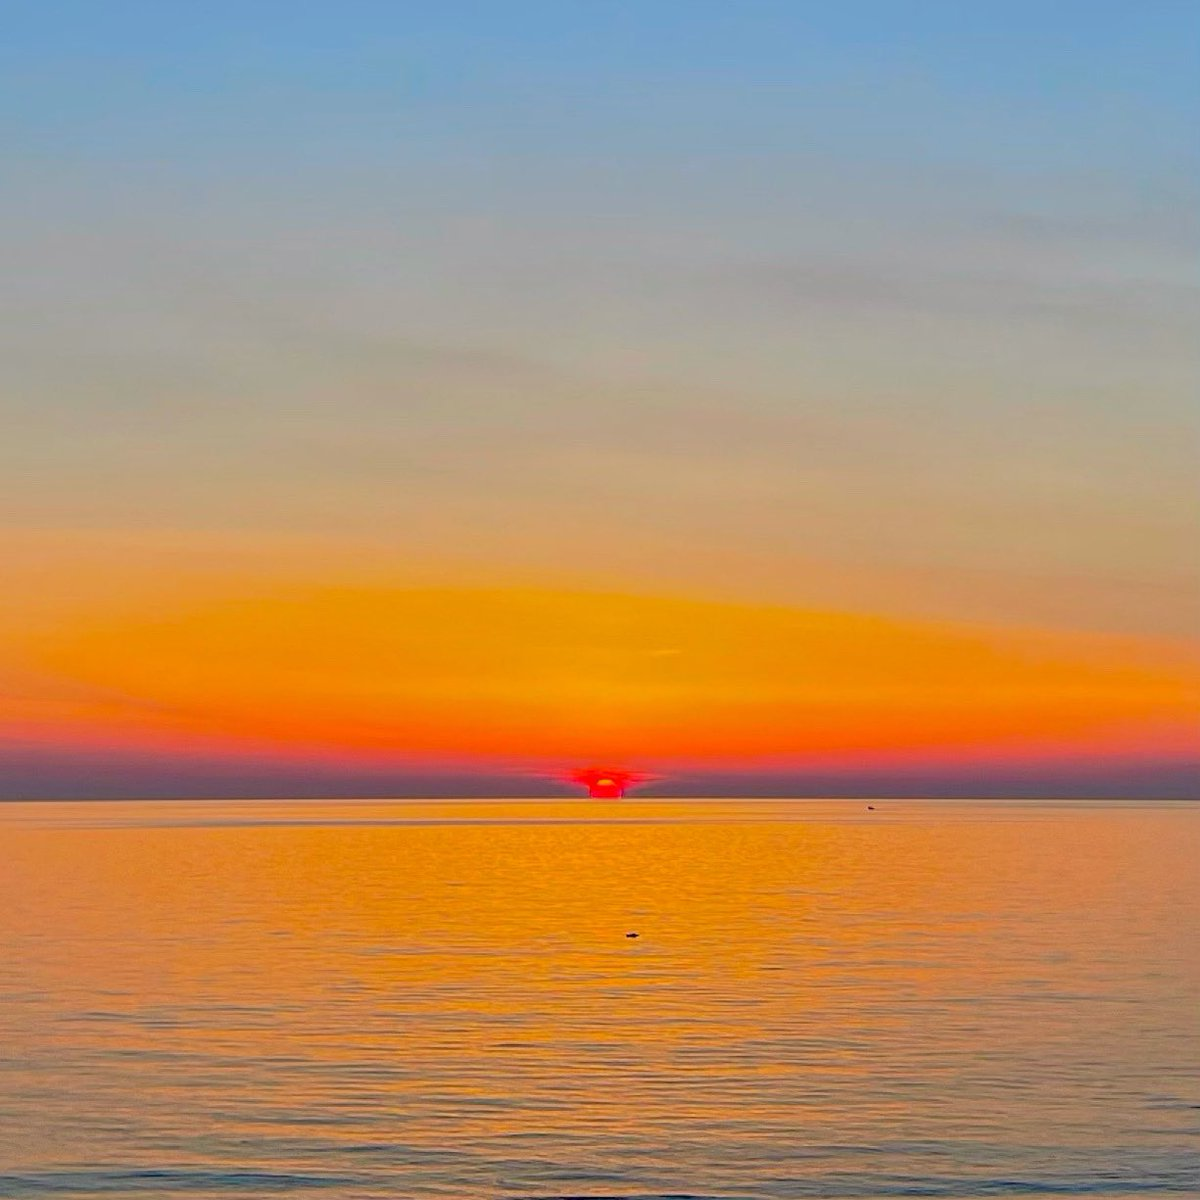 A red dot. A thin line.  #sunset #sun #photo #photography #sunsetphotography #sea #goldenhour #sky #colors #color #landscape #beauty #silence #picoftheday #peace #foto #tramonto #mare #pace #fotografia #italia #calabria #sud